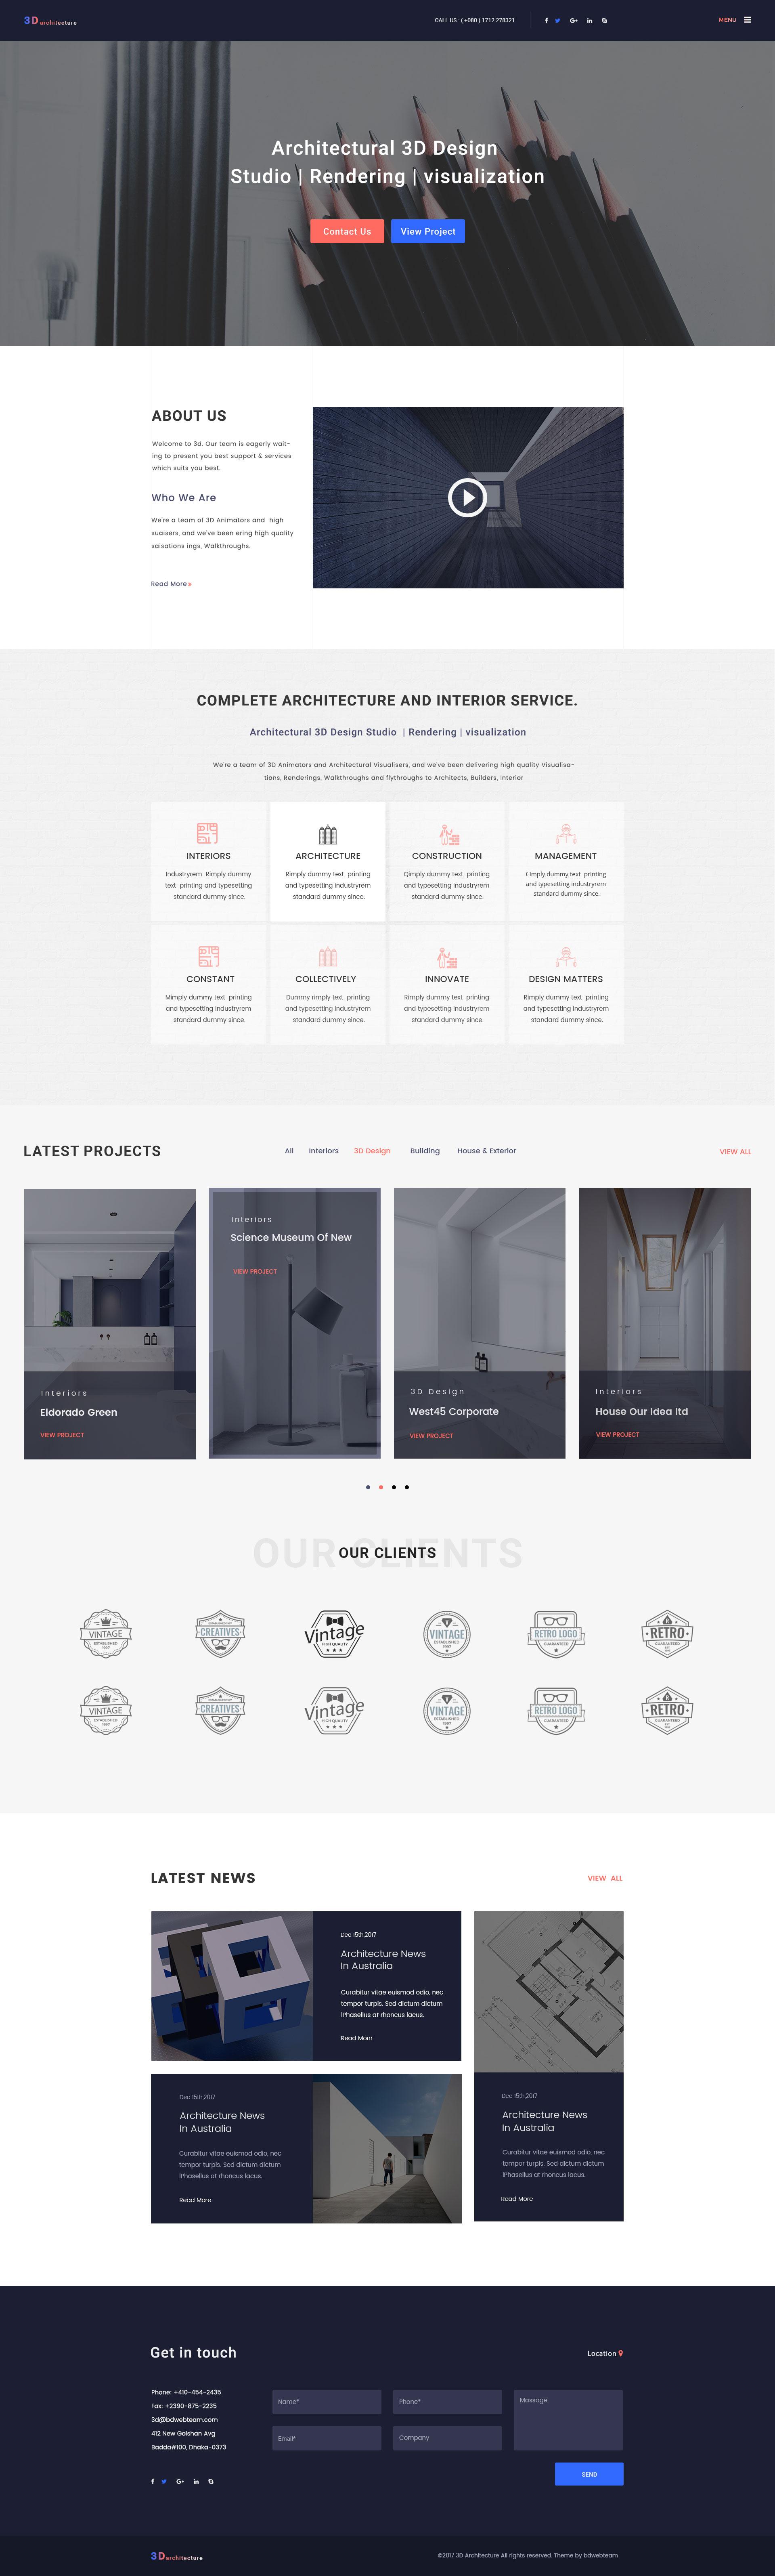 architecture 3d architecturalinterior 3d design studio psd template